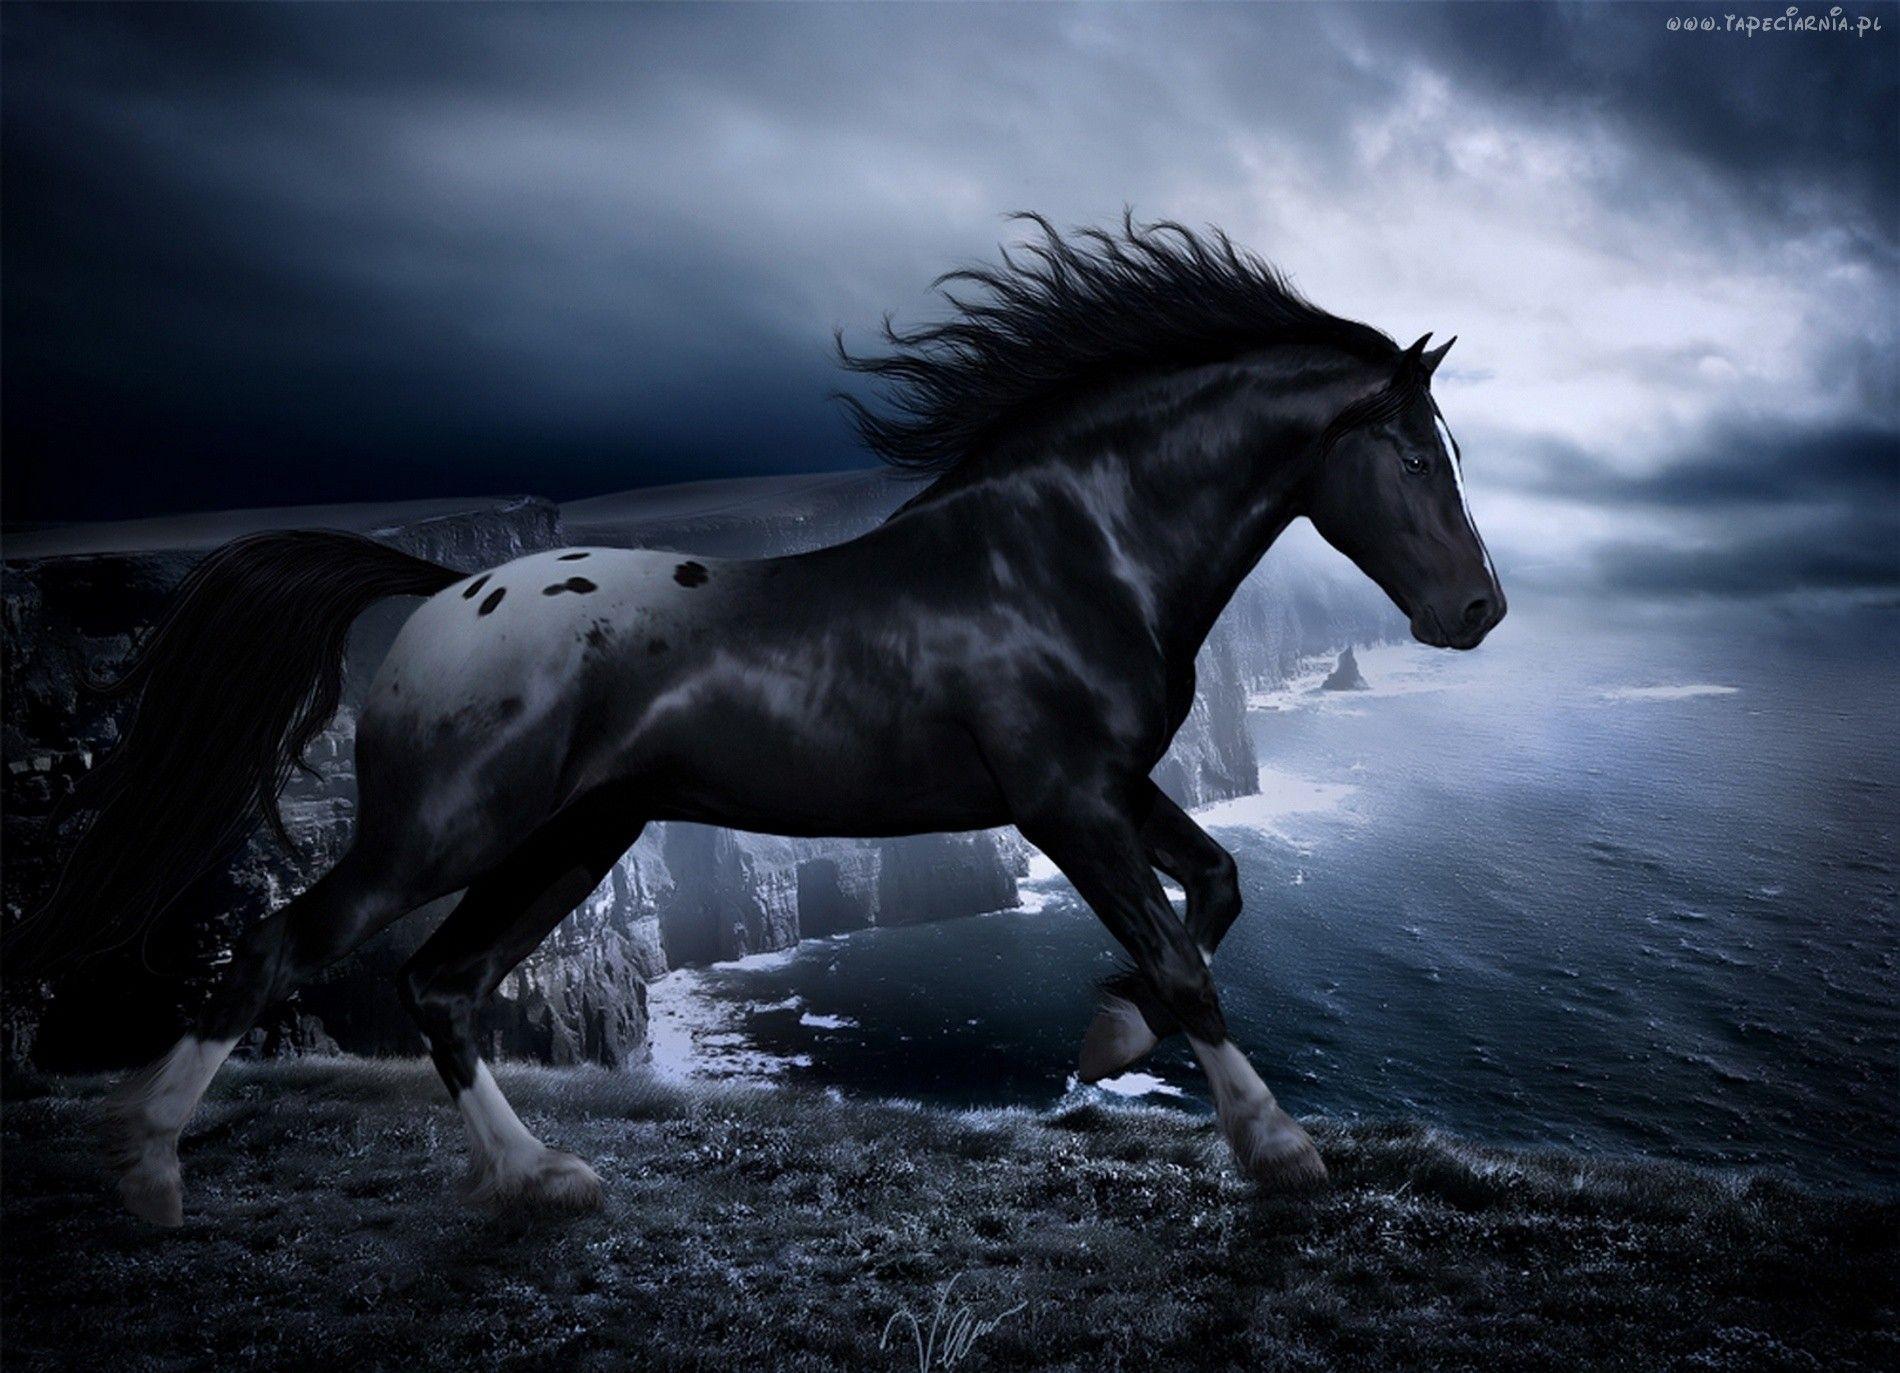 Dark Horse Wallpapers - Wallpaper Cave